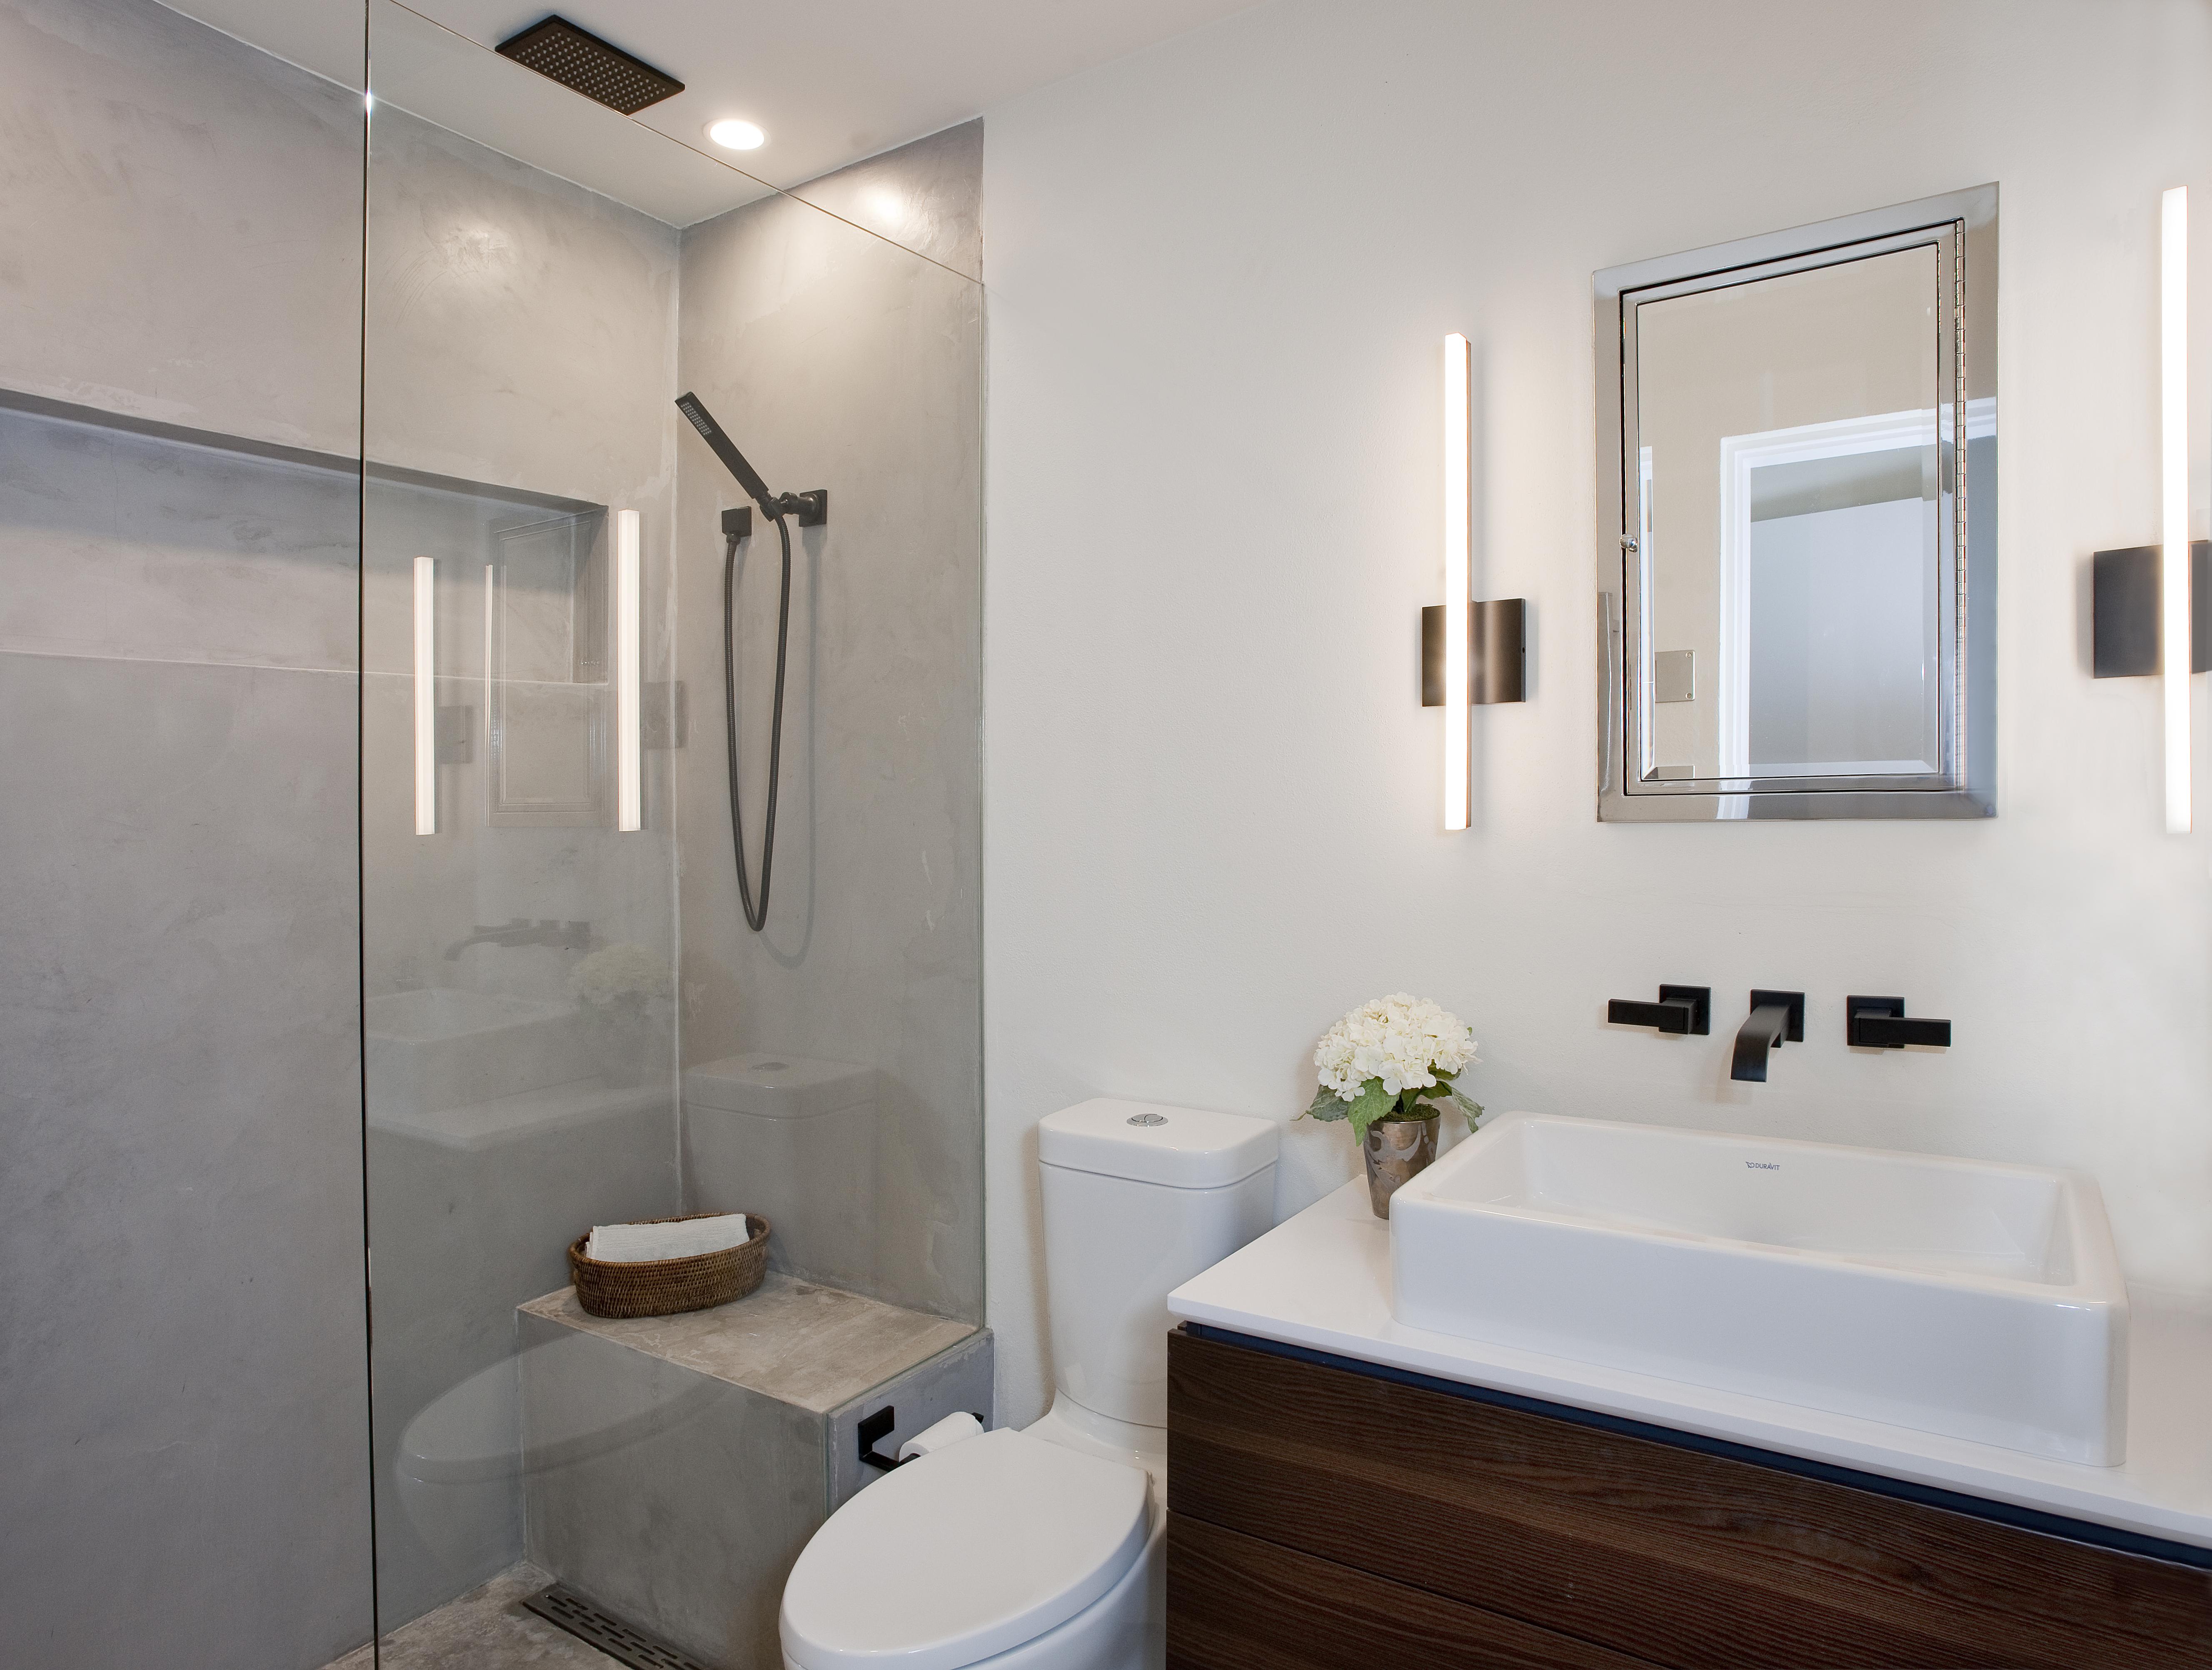 Kitchens and Bathrooms, Bermuda, Hamilton| Hamma Galleries